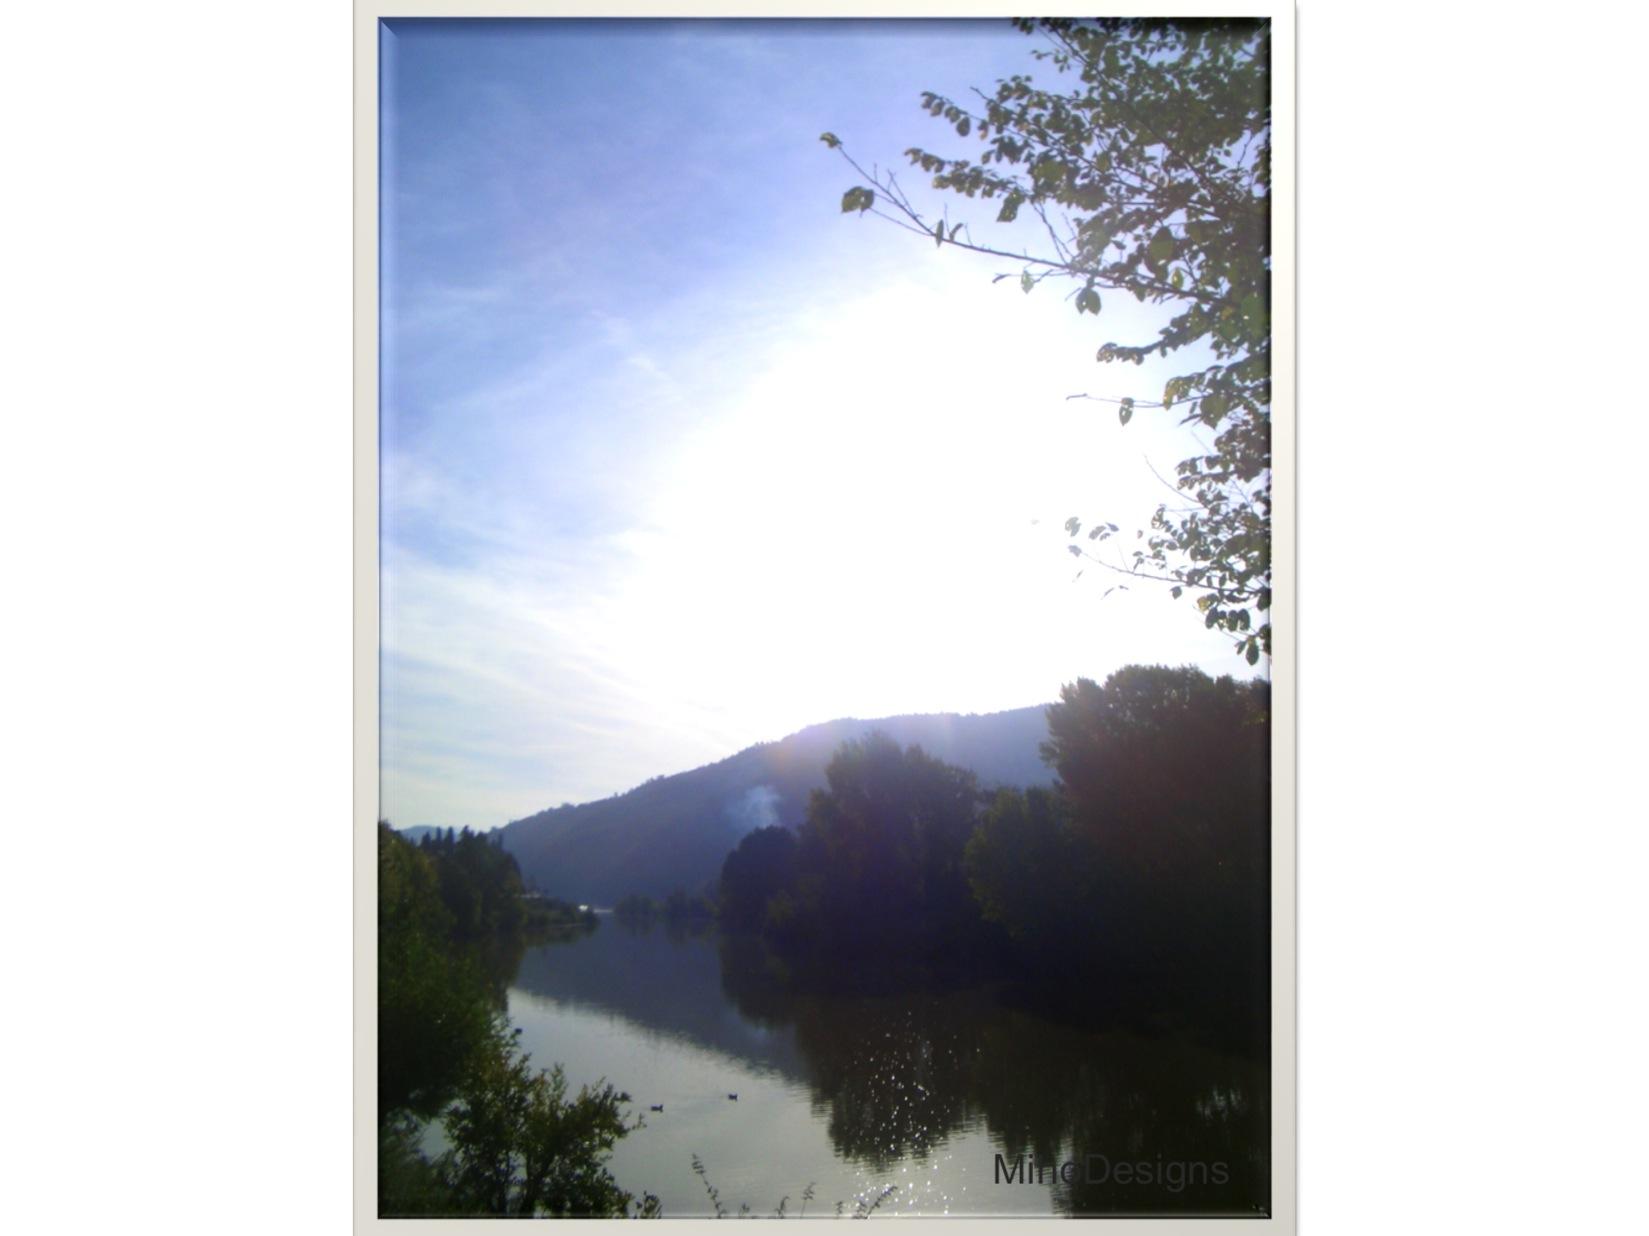 c0293449_18492074.jpg